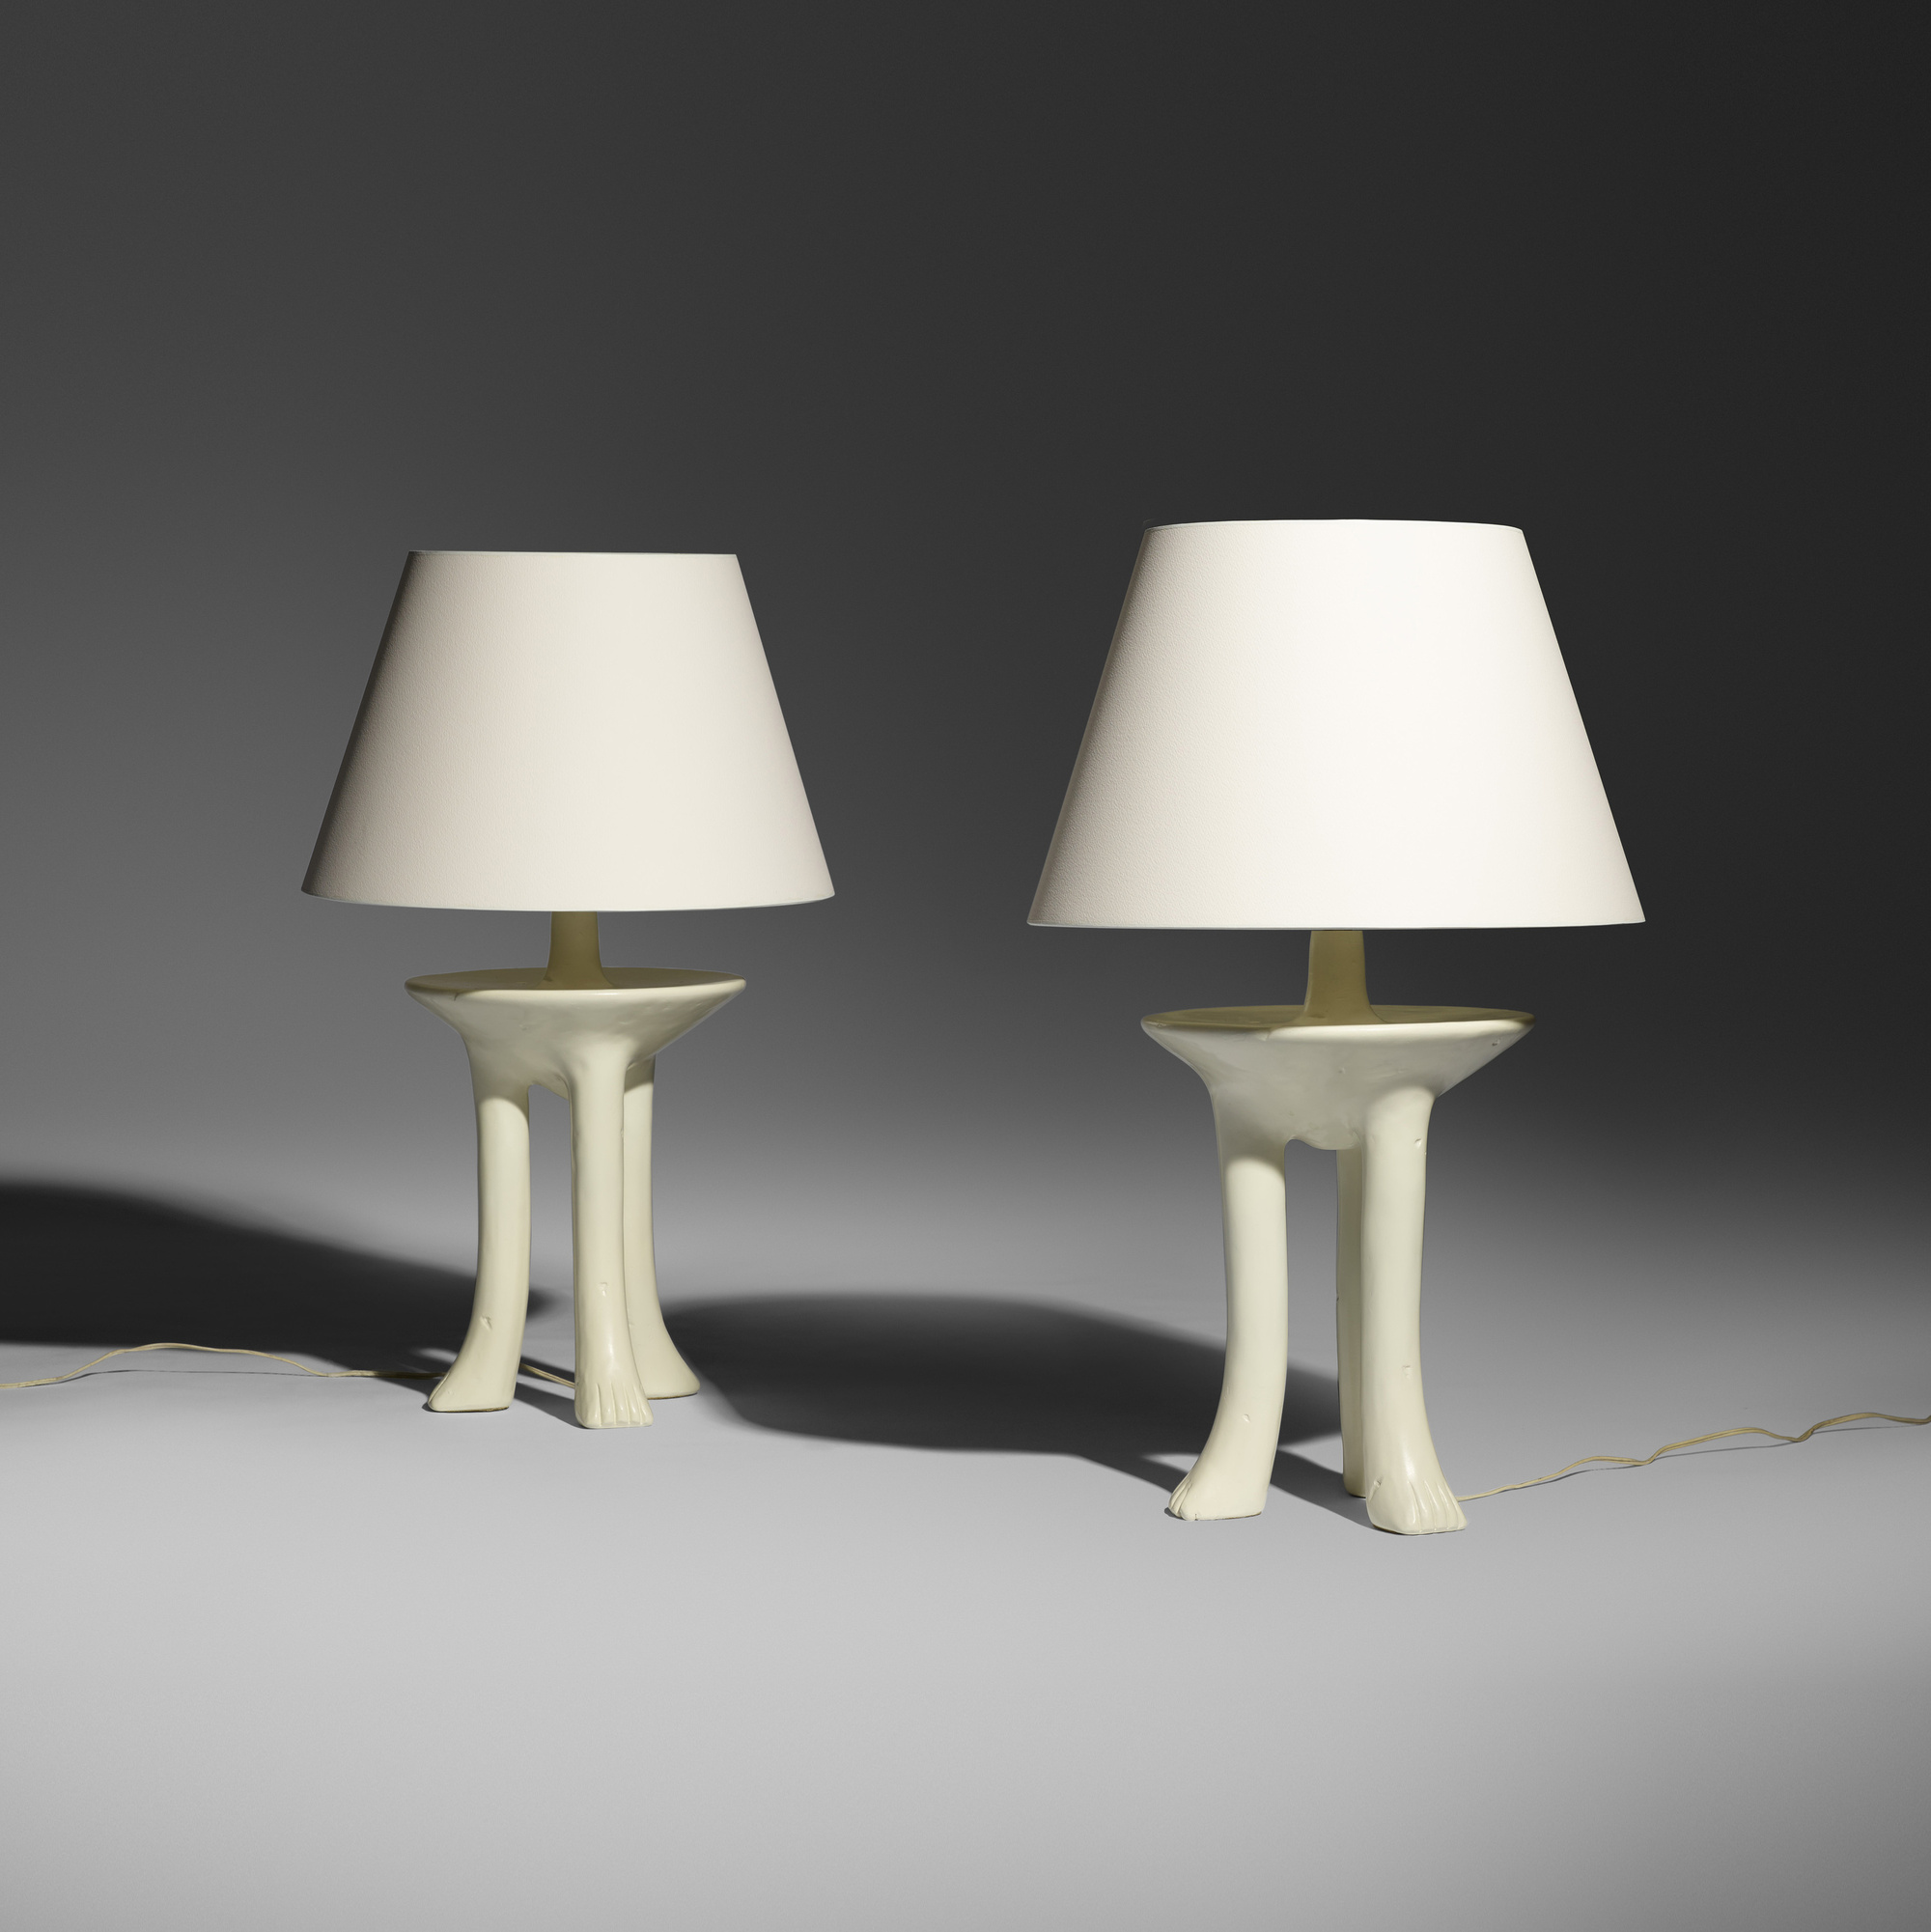 376: John Dickinson / African table lamps, pair (2 of 3)